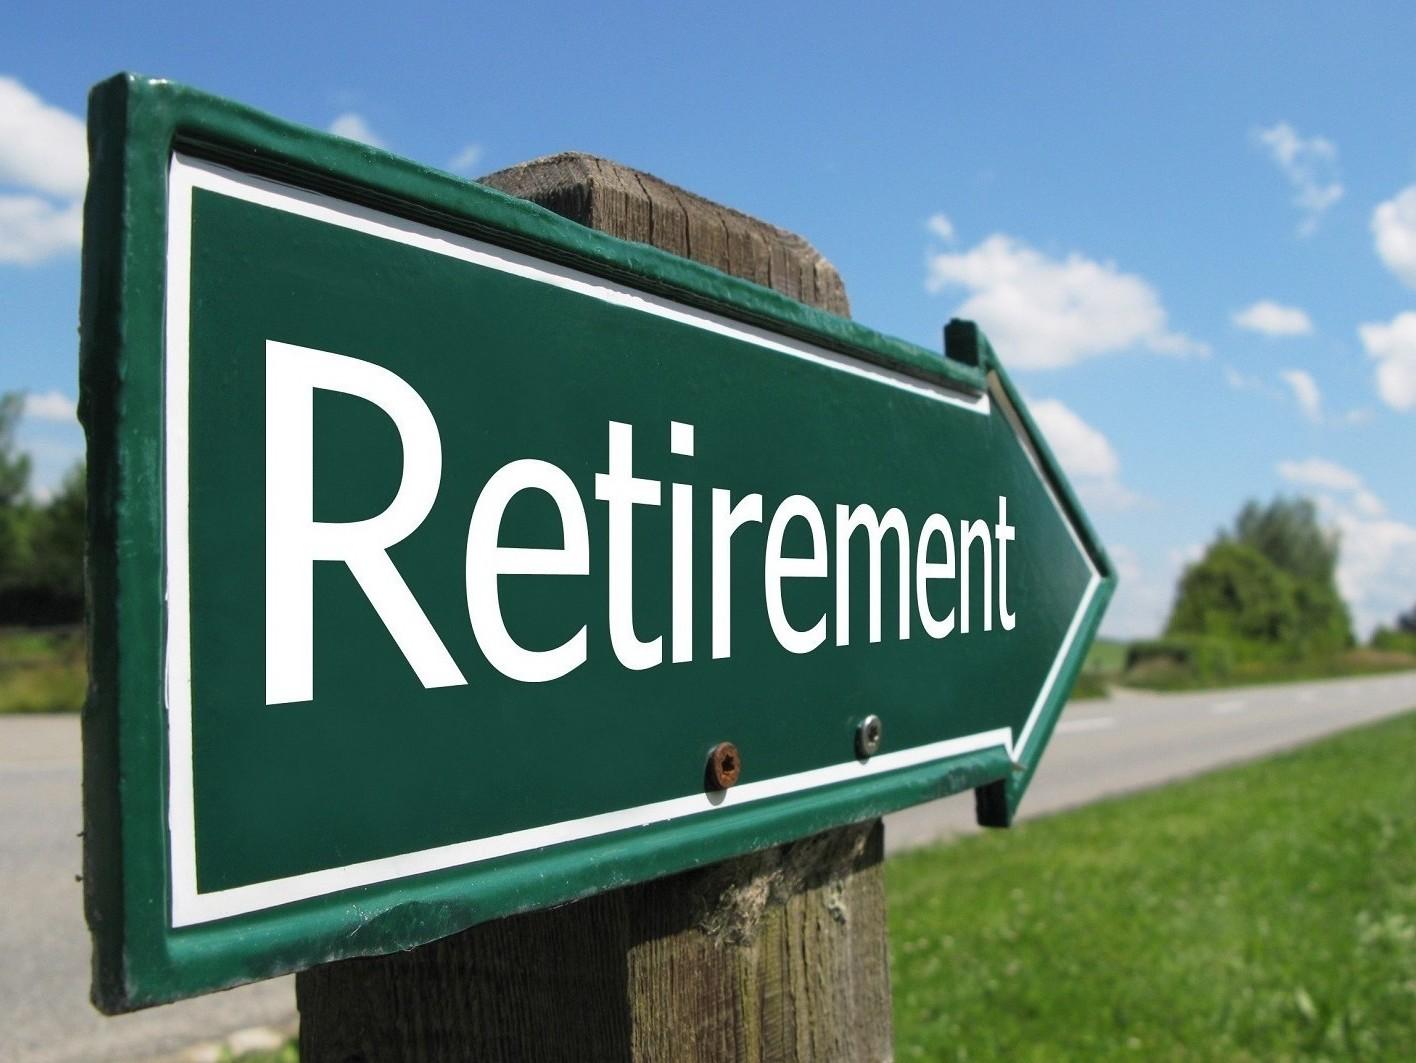 Pensioni quota 100 a chi spetta, requisi